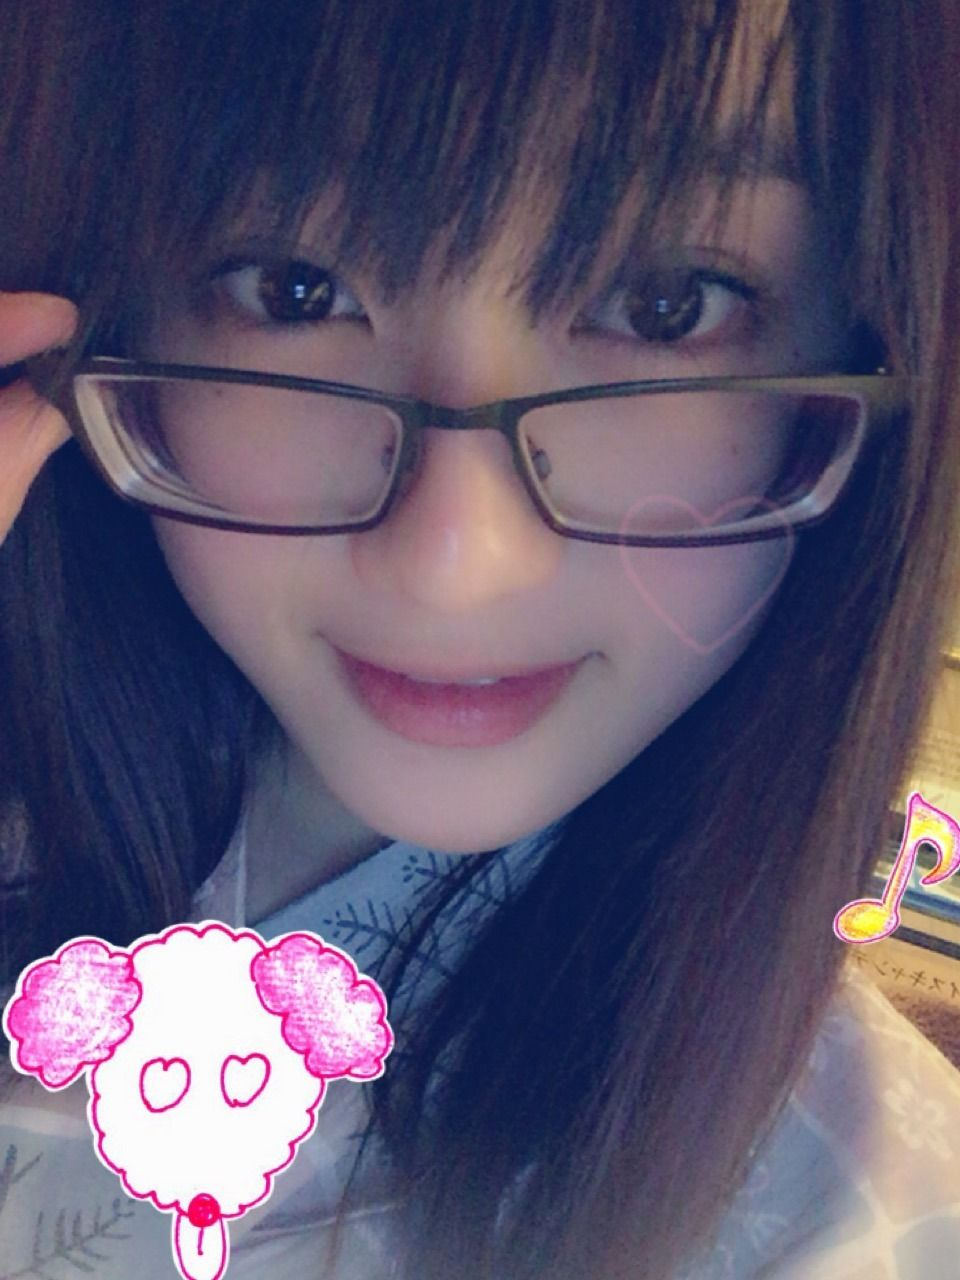 wpid-sub-member-913_01_jpg